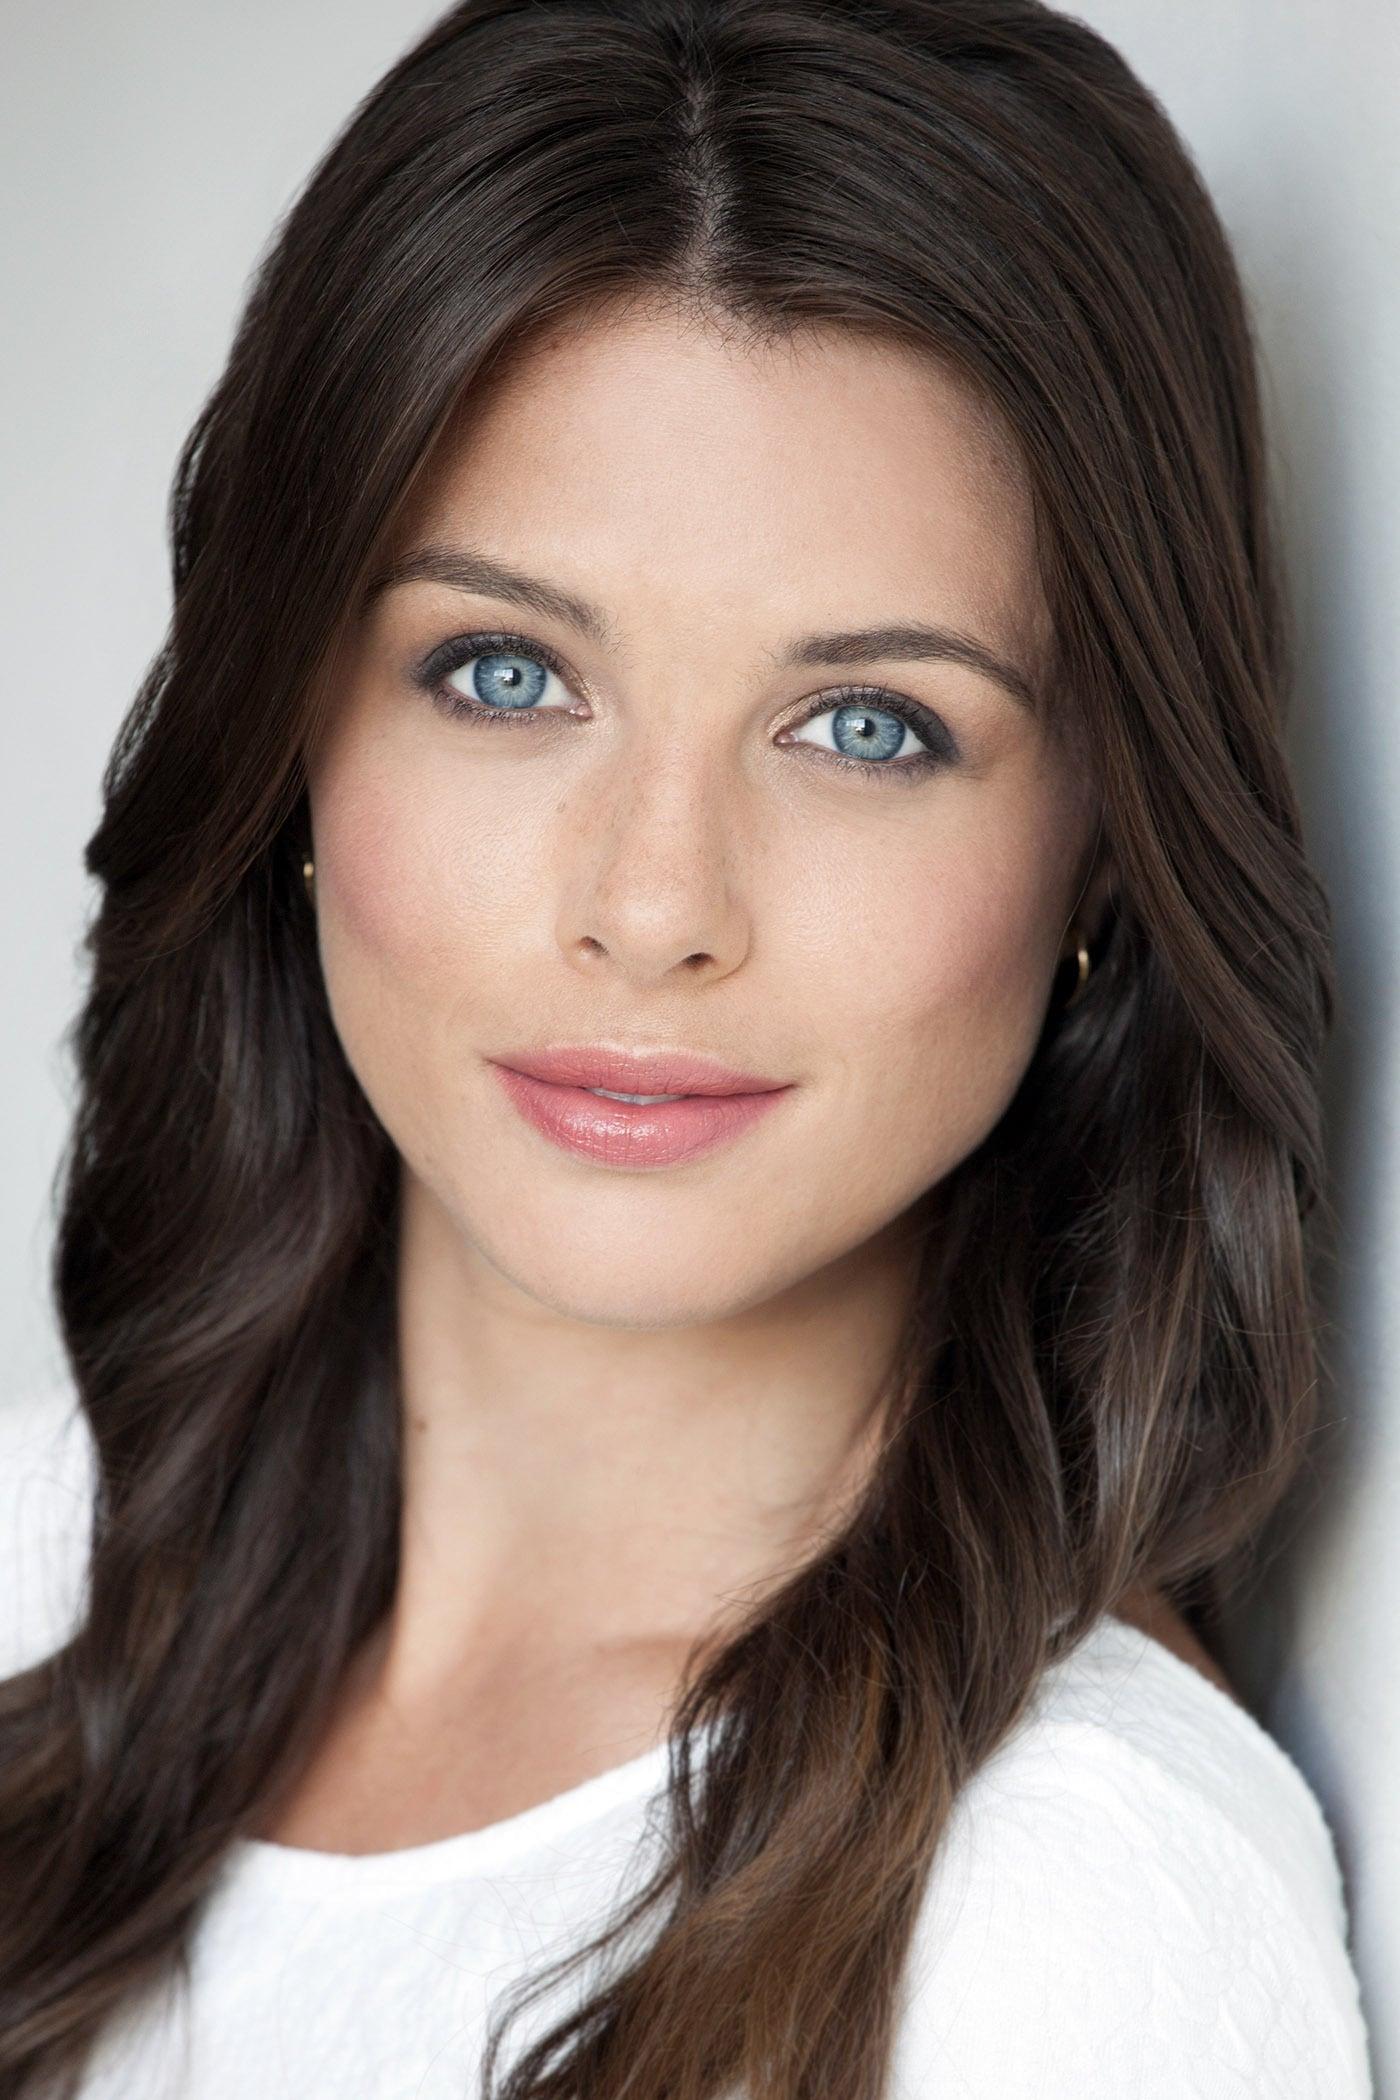 Alanna LeVierge